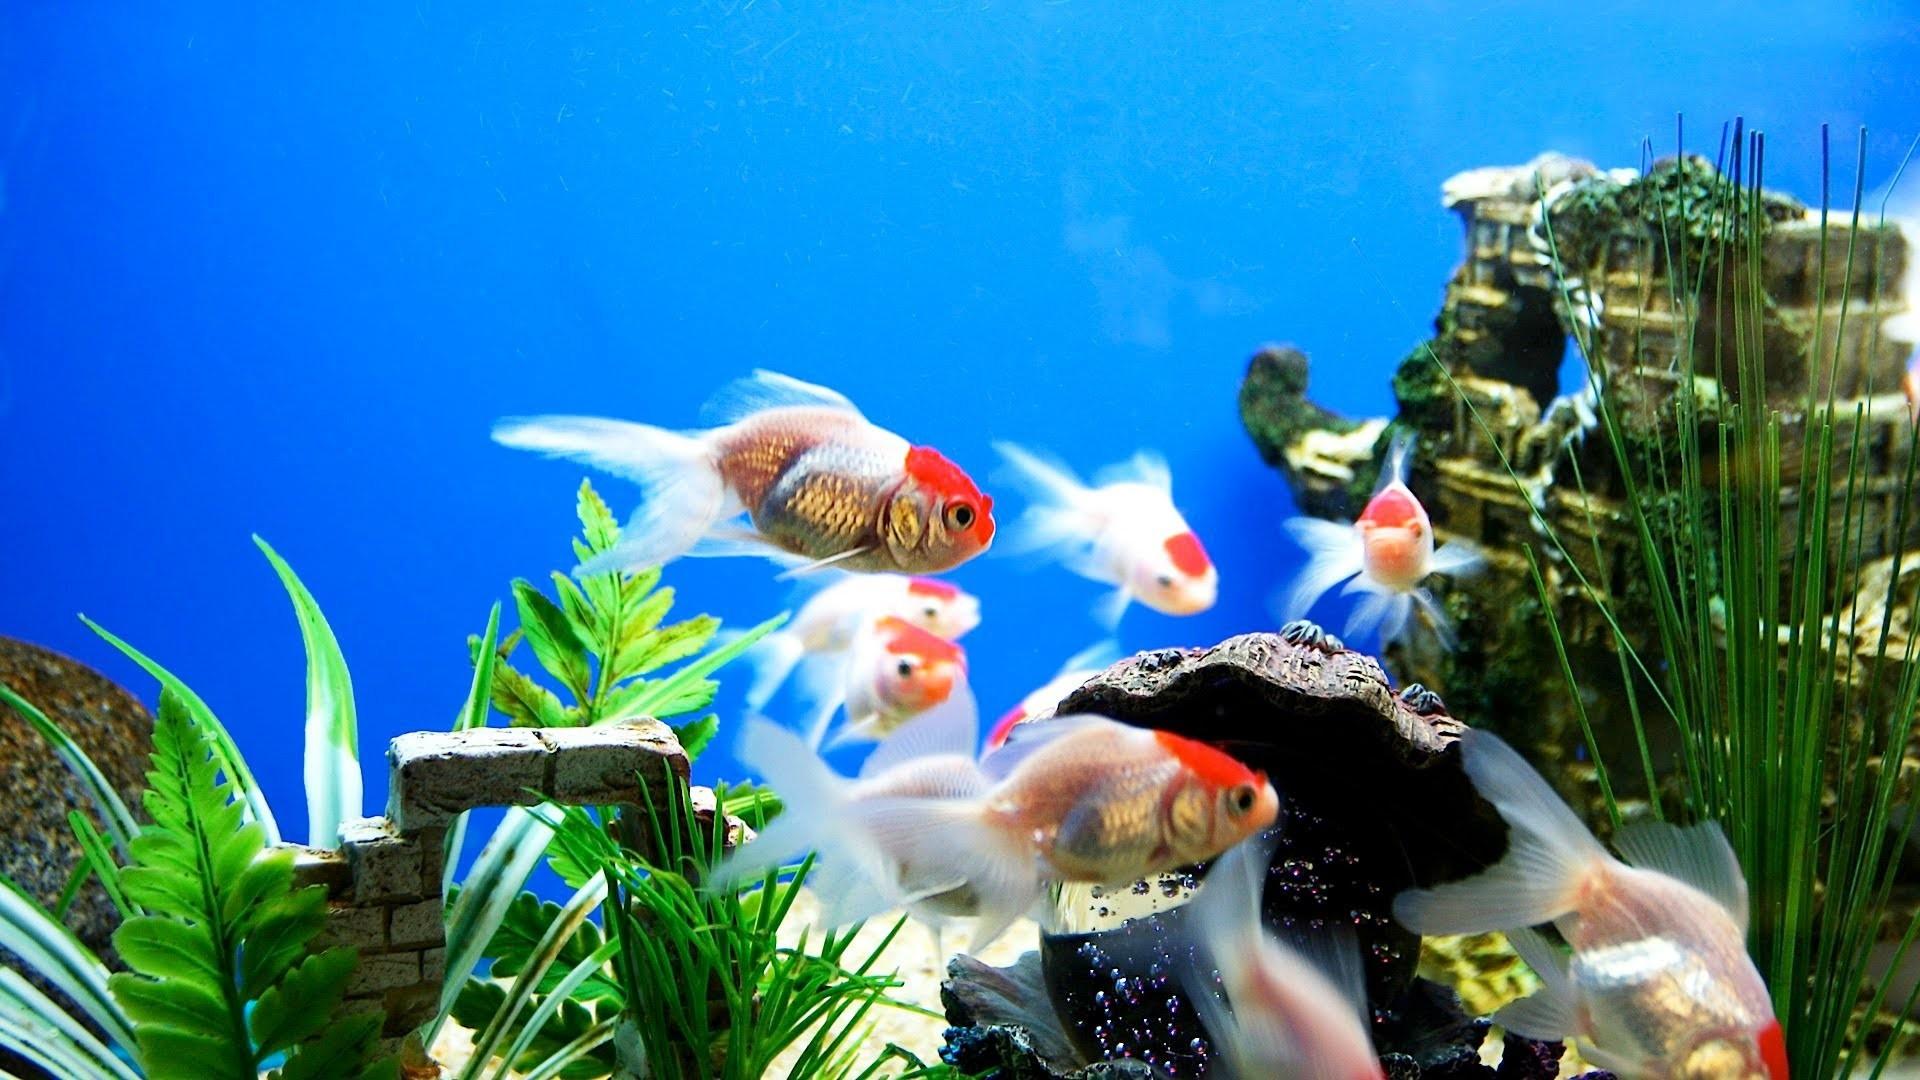 Cool aquarium screensavers for windows cool wallpaper hd : cool